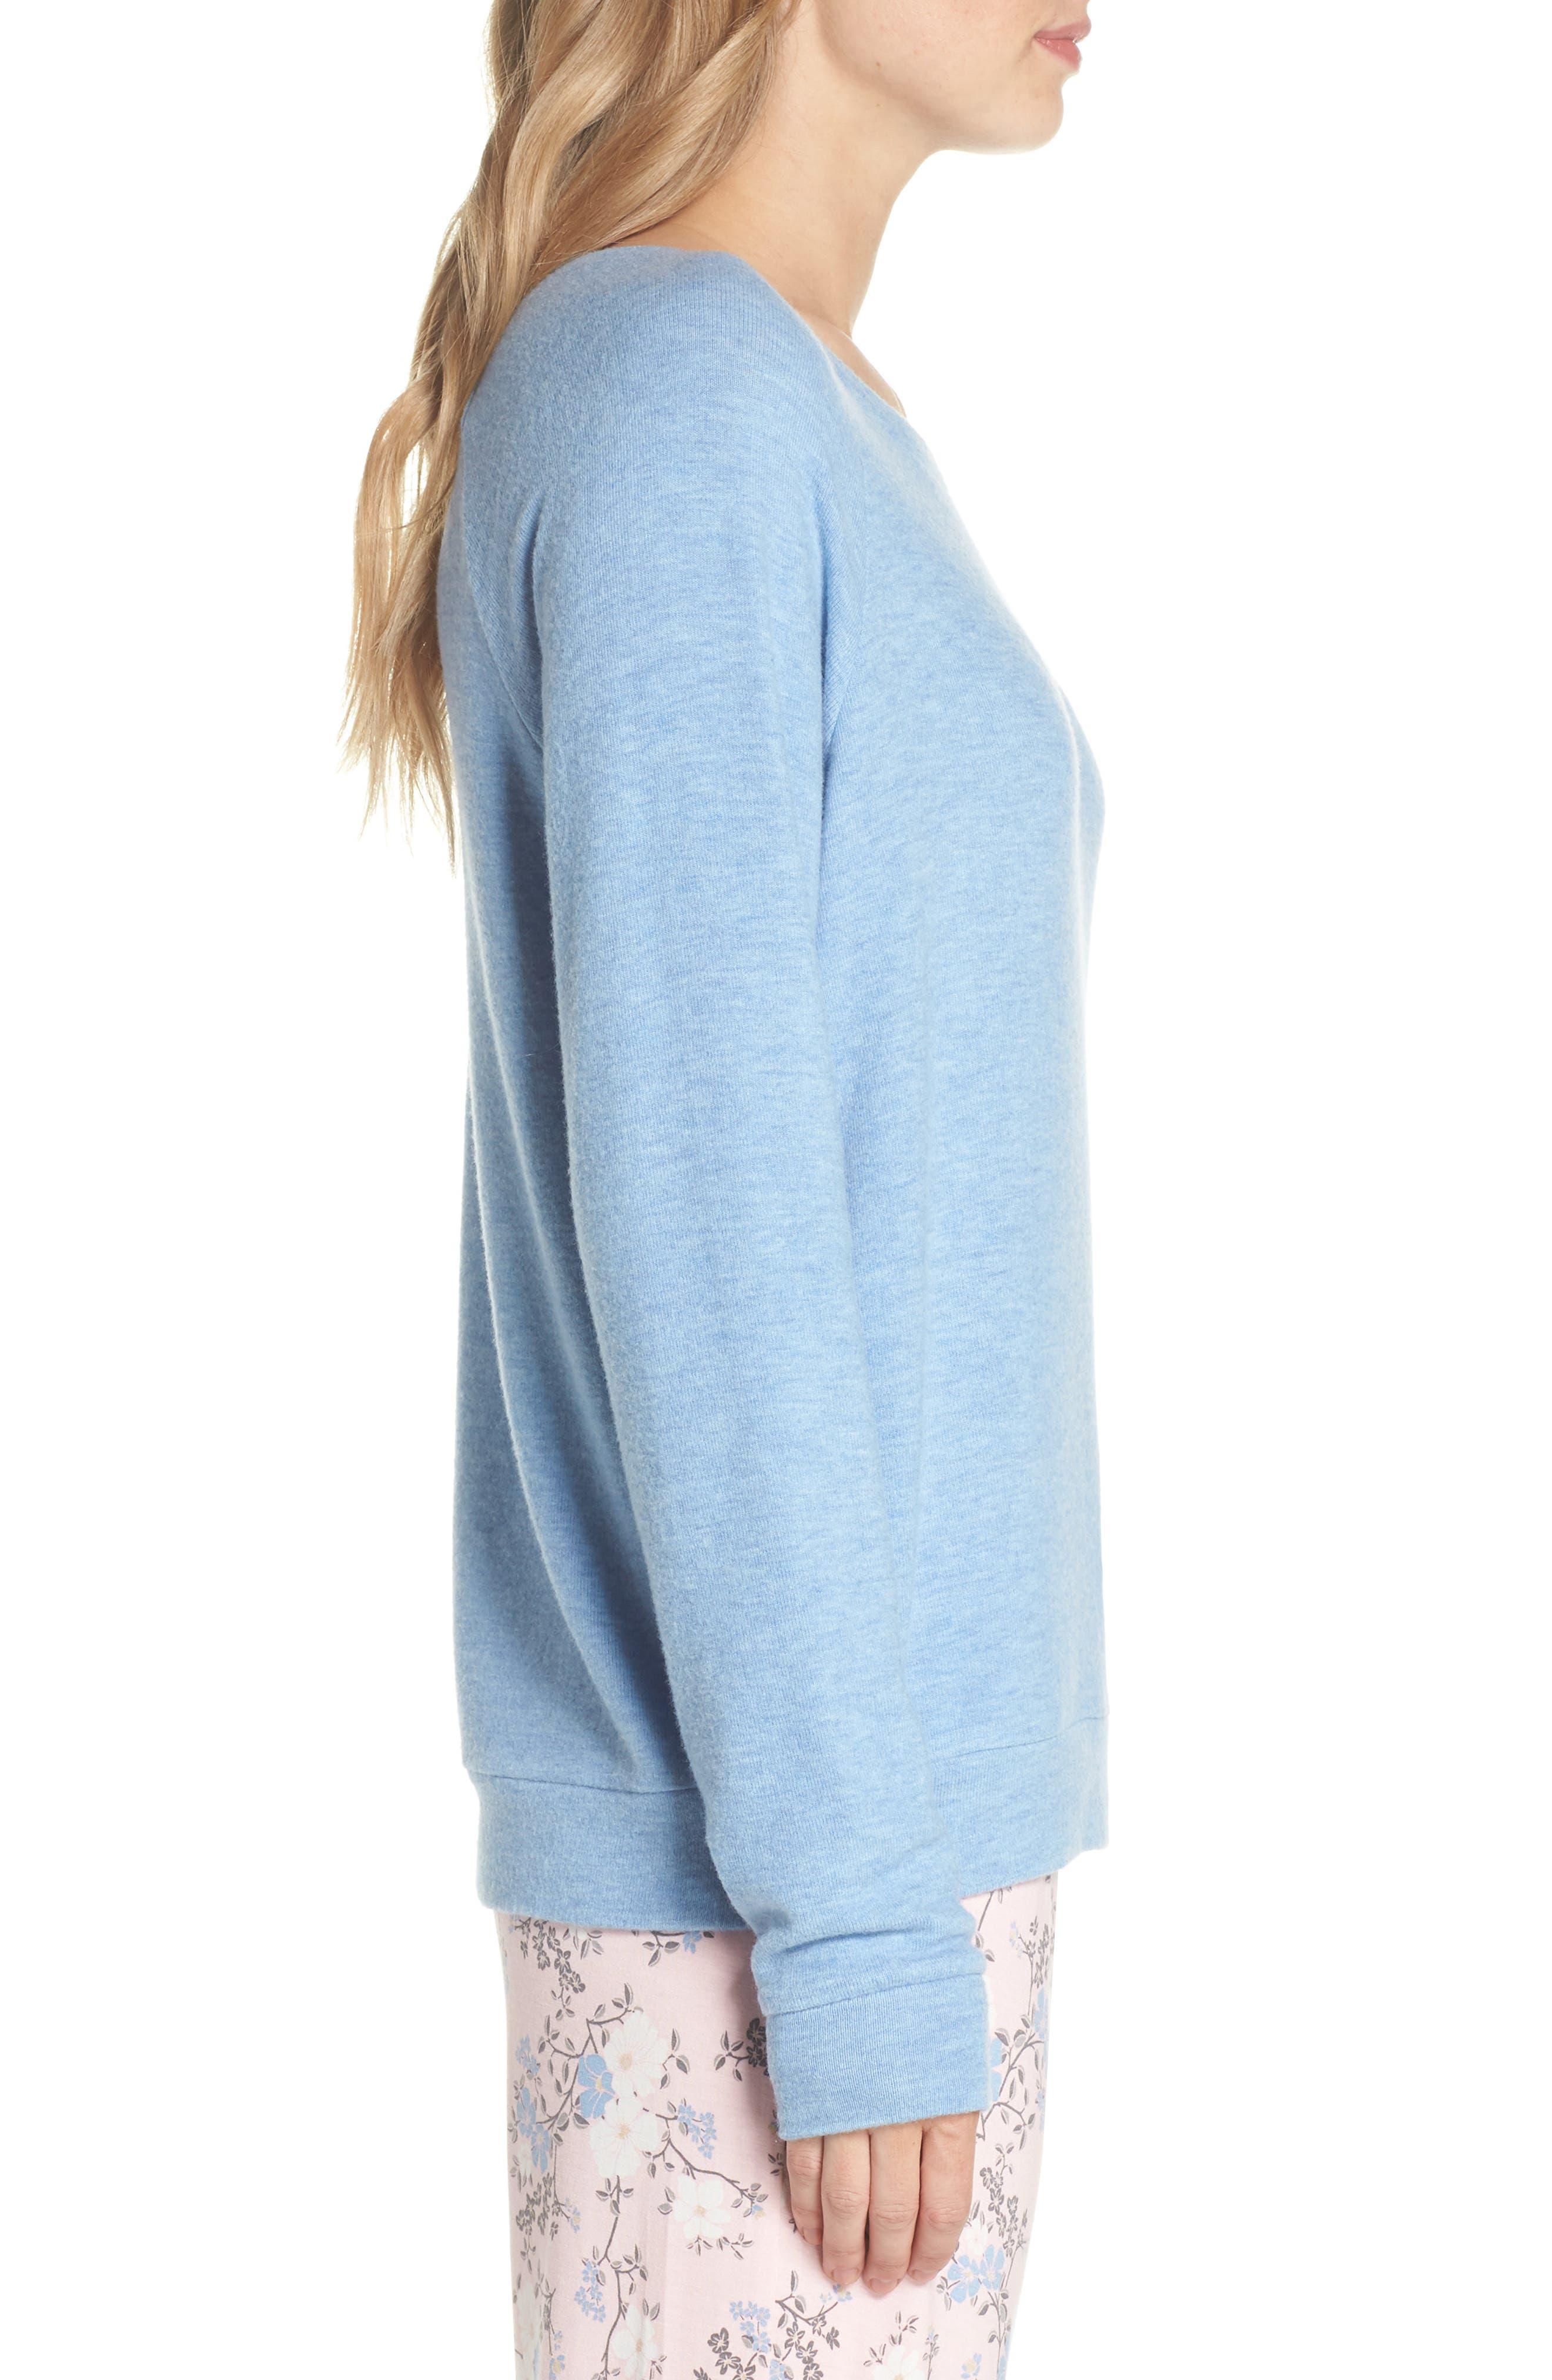 Peachy Pajama Shirt,                             Alternate thumbnail 3, color,                             Blue